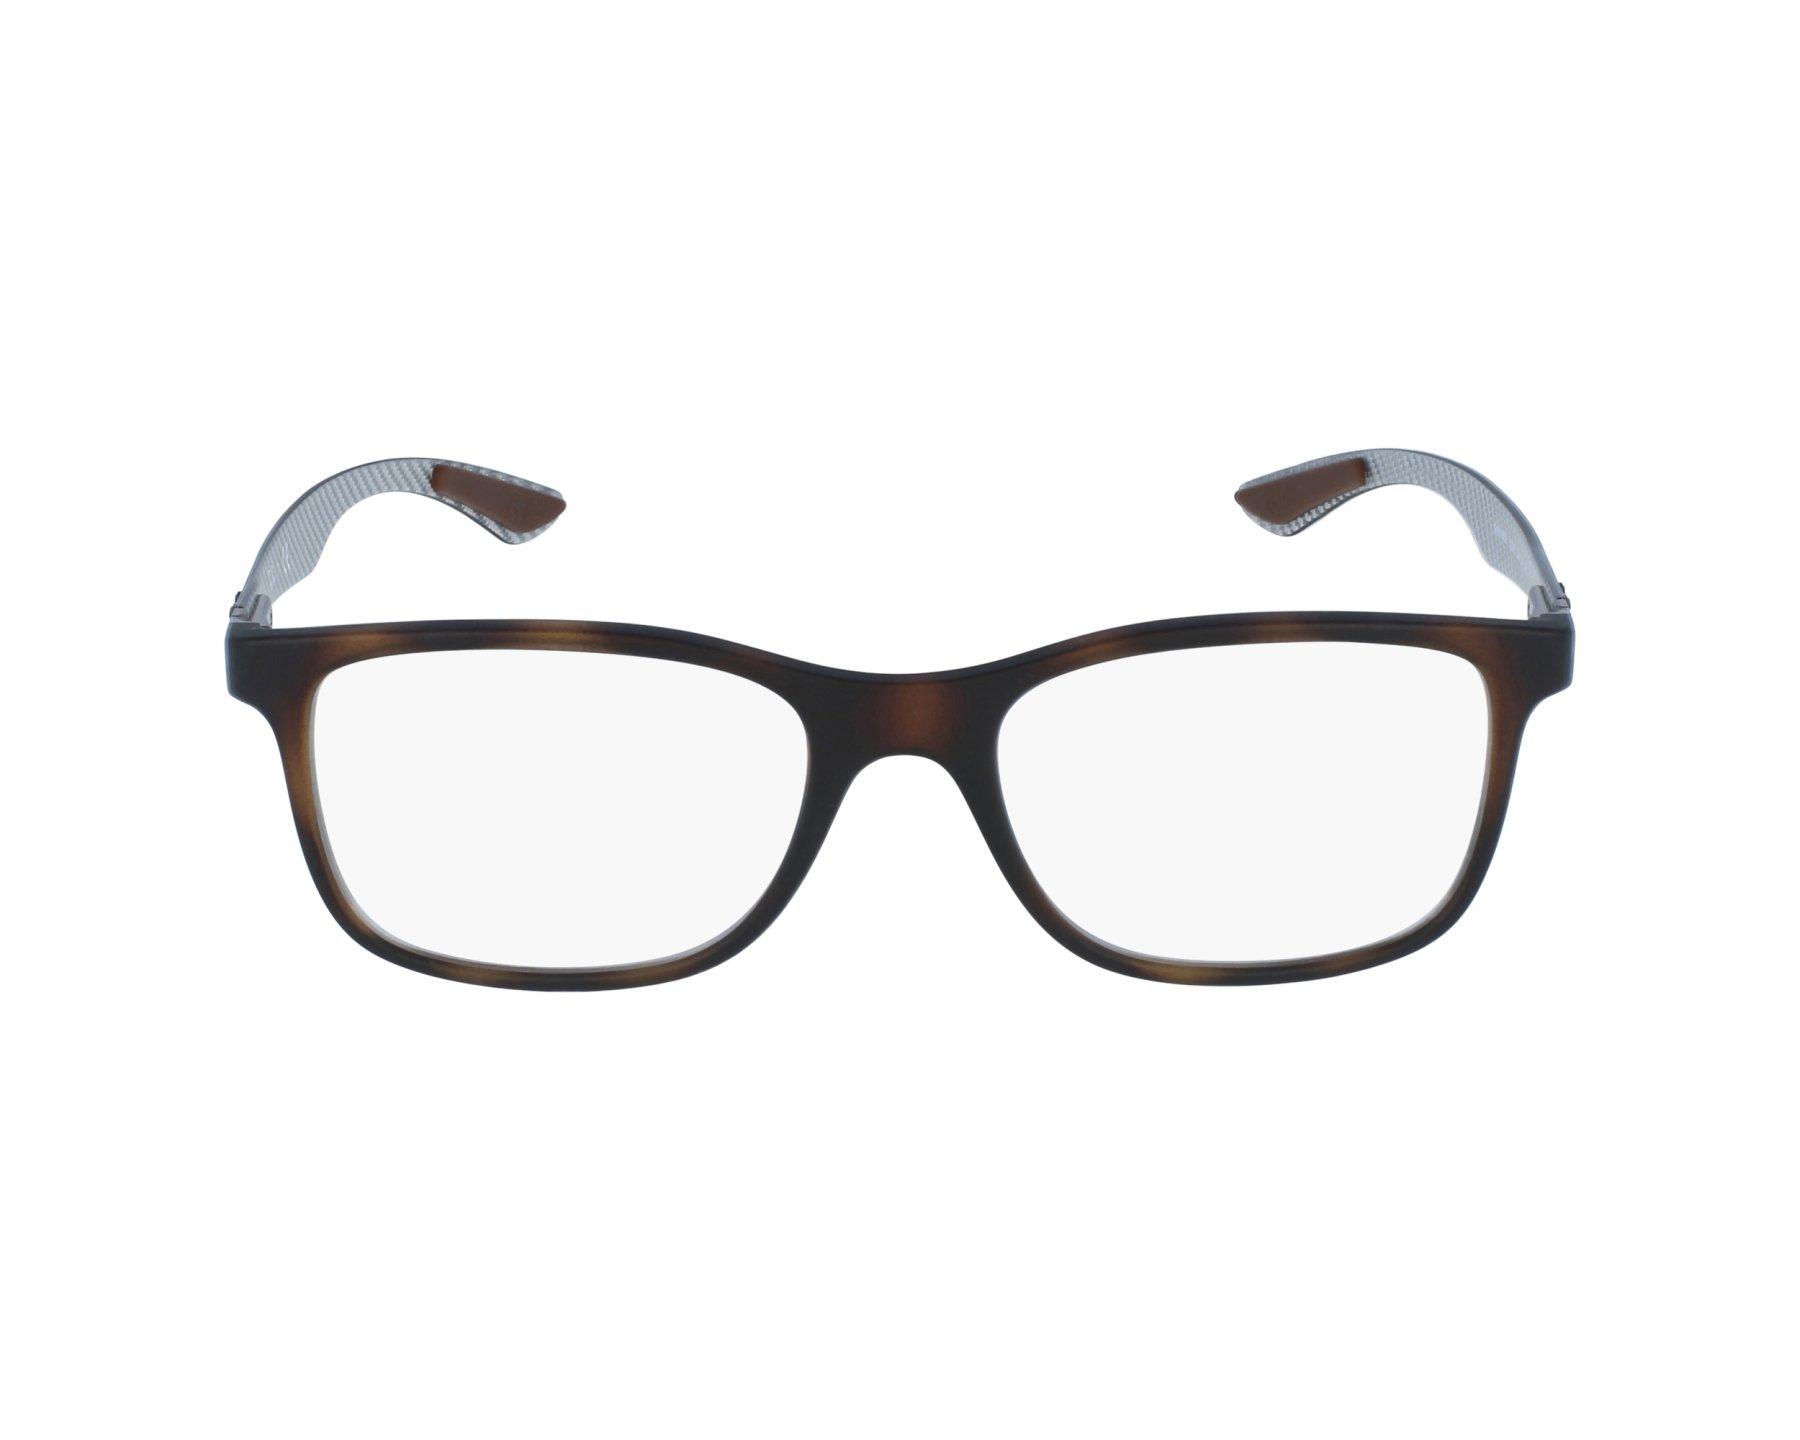 Buy Ray-Ban Eyeglasses RX-8903 5200 Online - Visionet UK